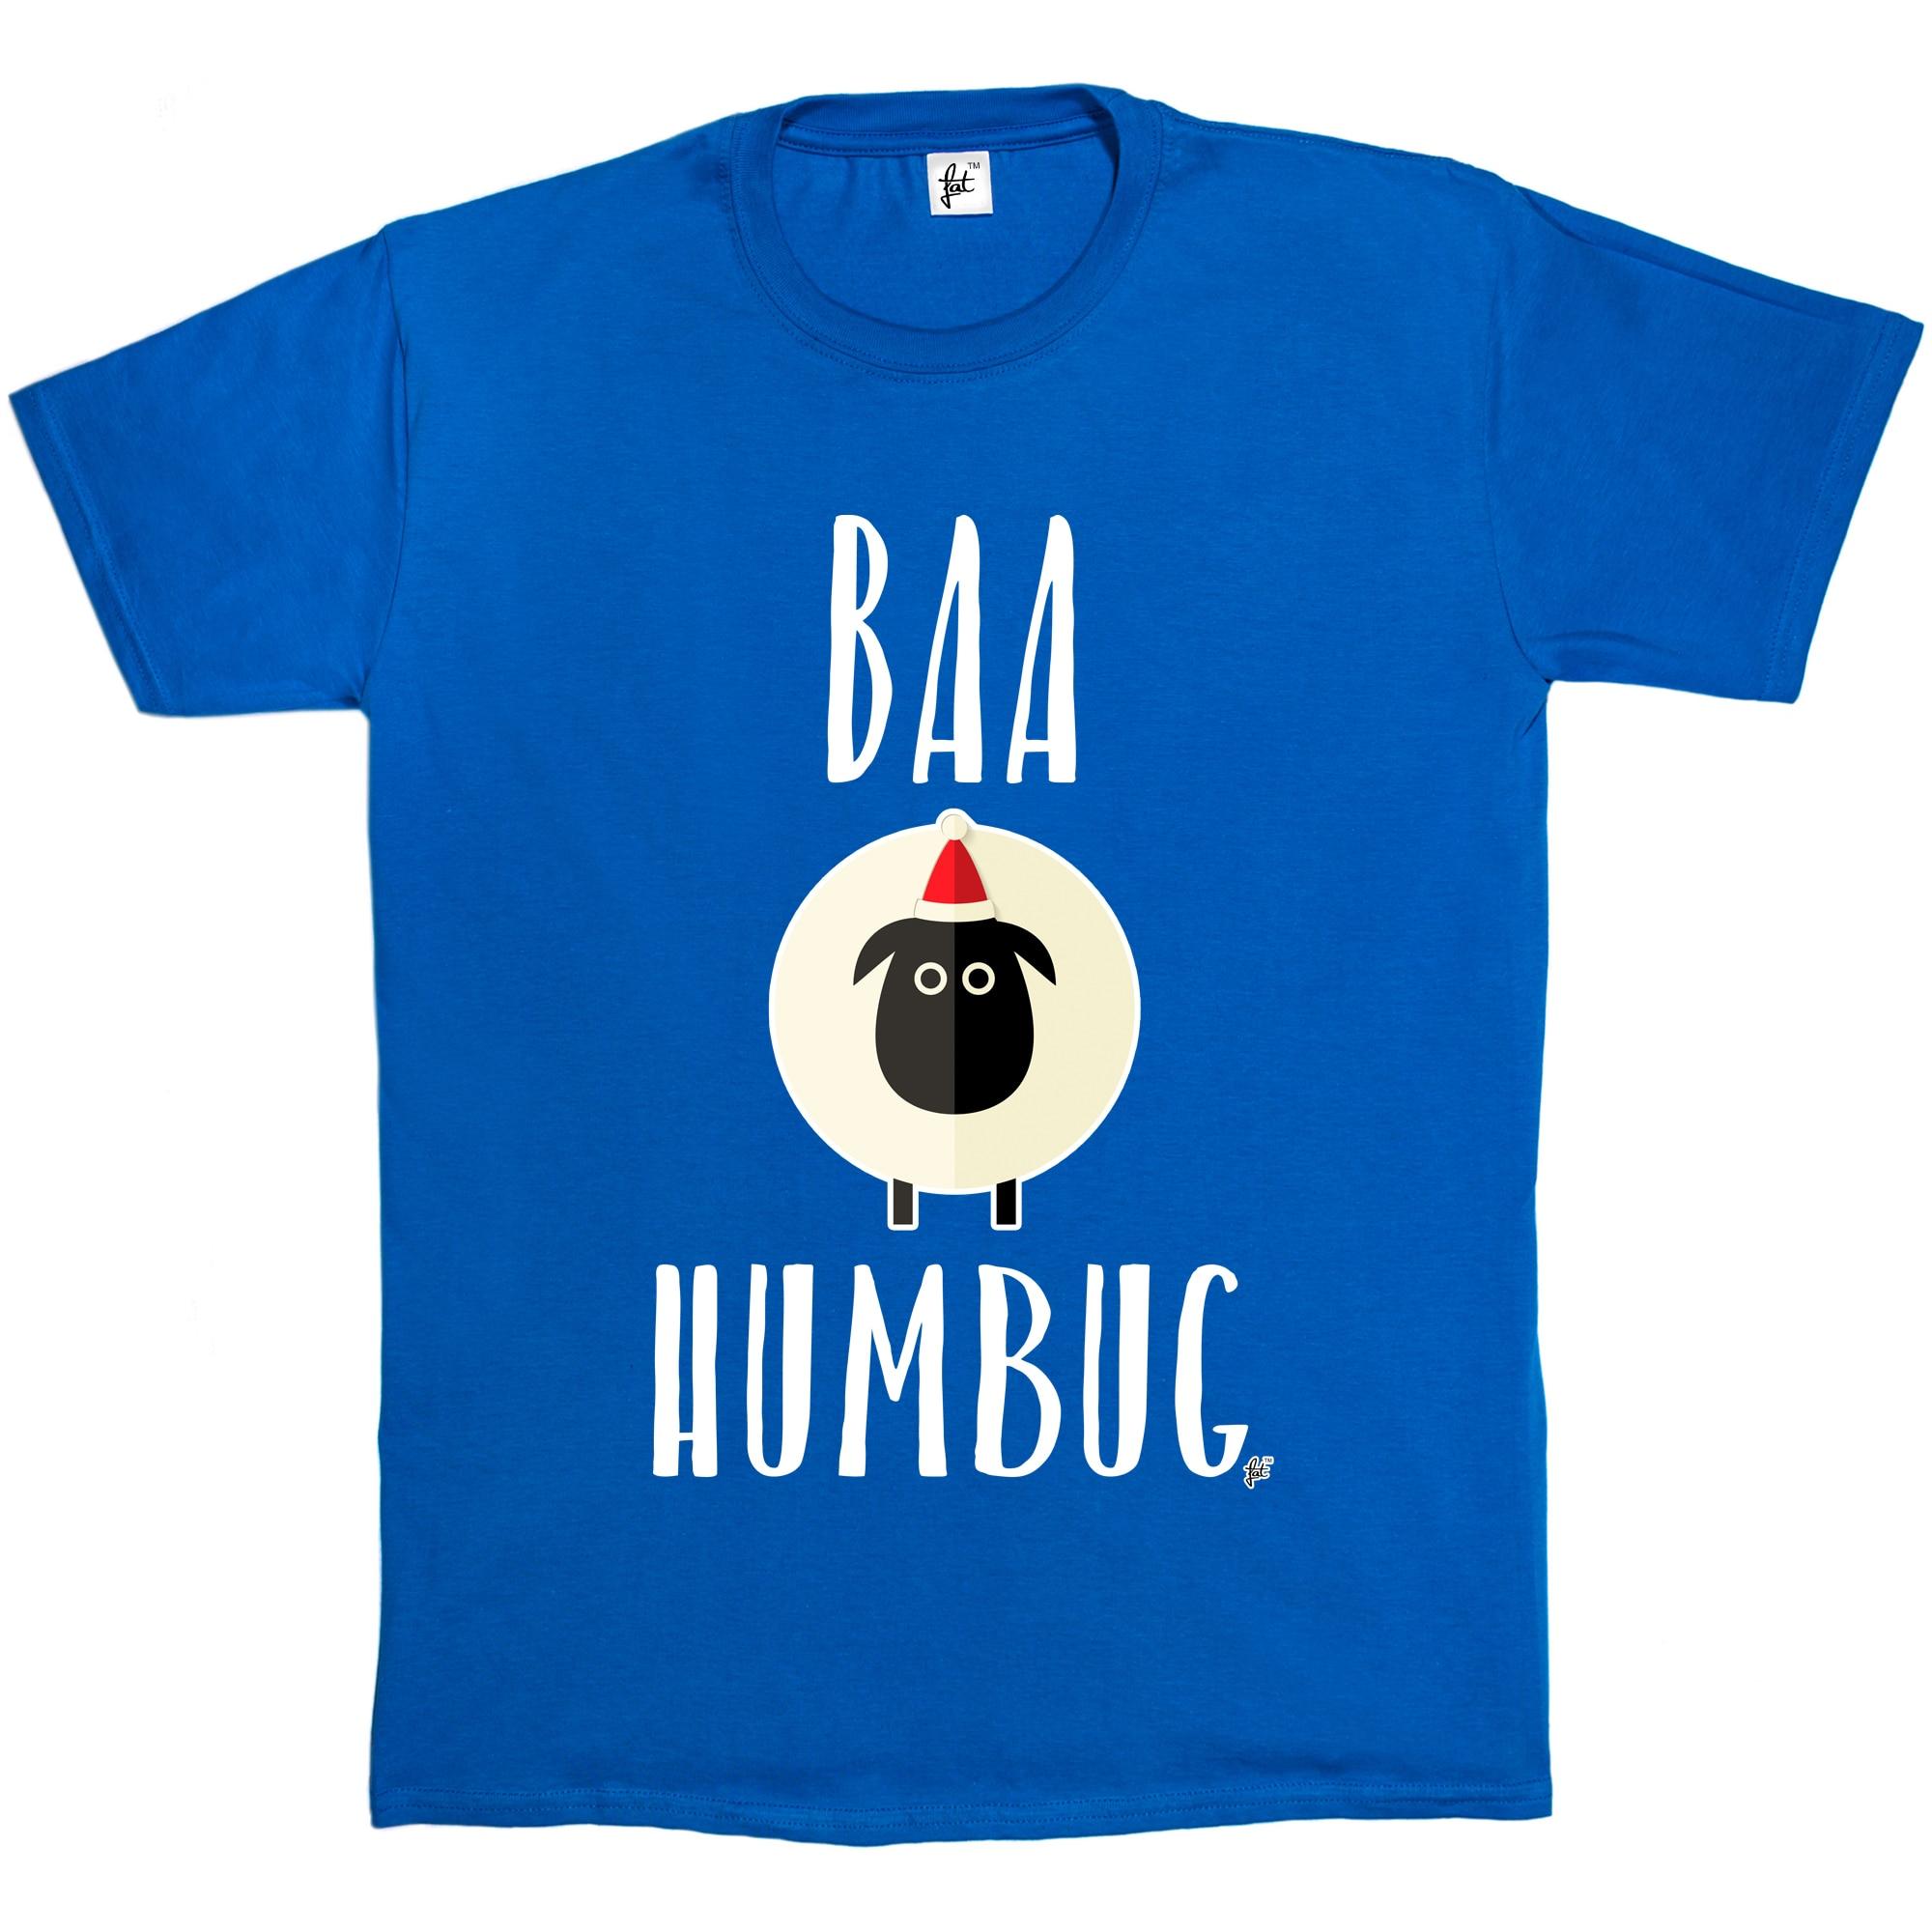 a007811f0e Baa Humbug White Sheep Bah Humbug Anti Christmas Mens T Shirt Men Tee Shirt  Tops Short Sleeve Cotton Fitness T Shirts-in T-Shirts from Men's Clothing  on ...